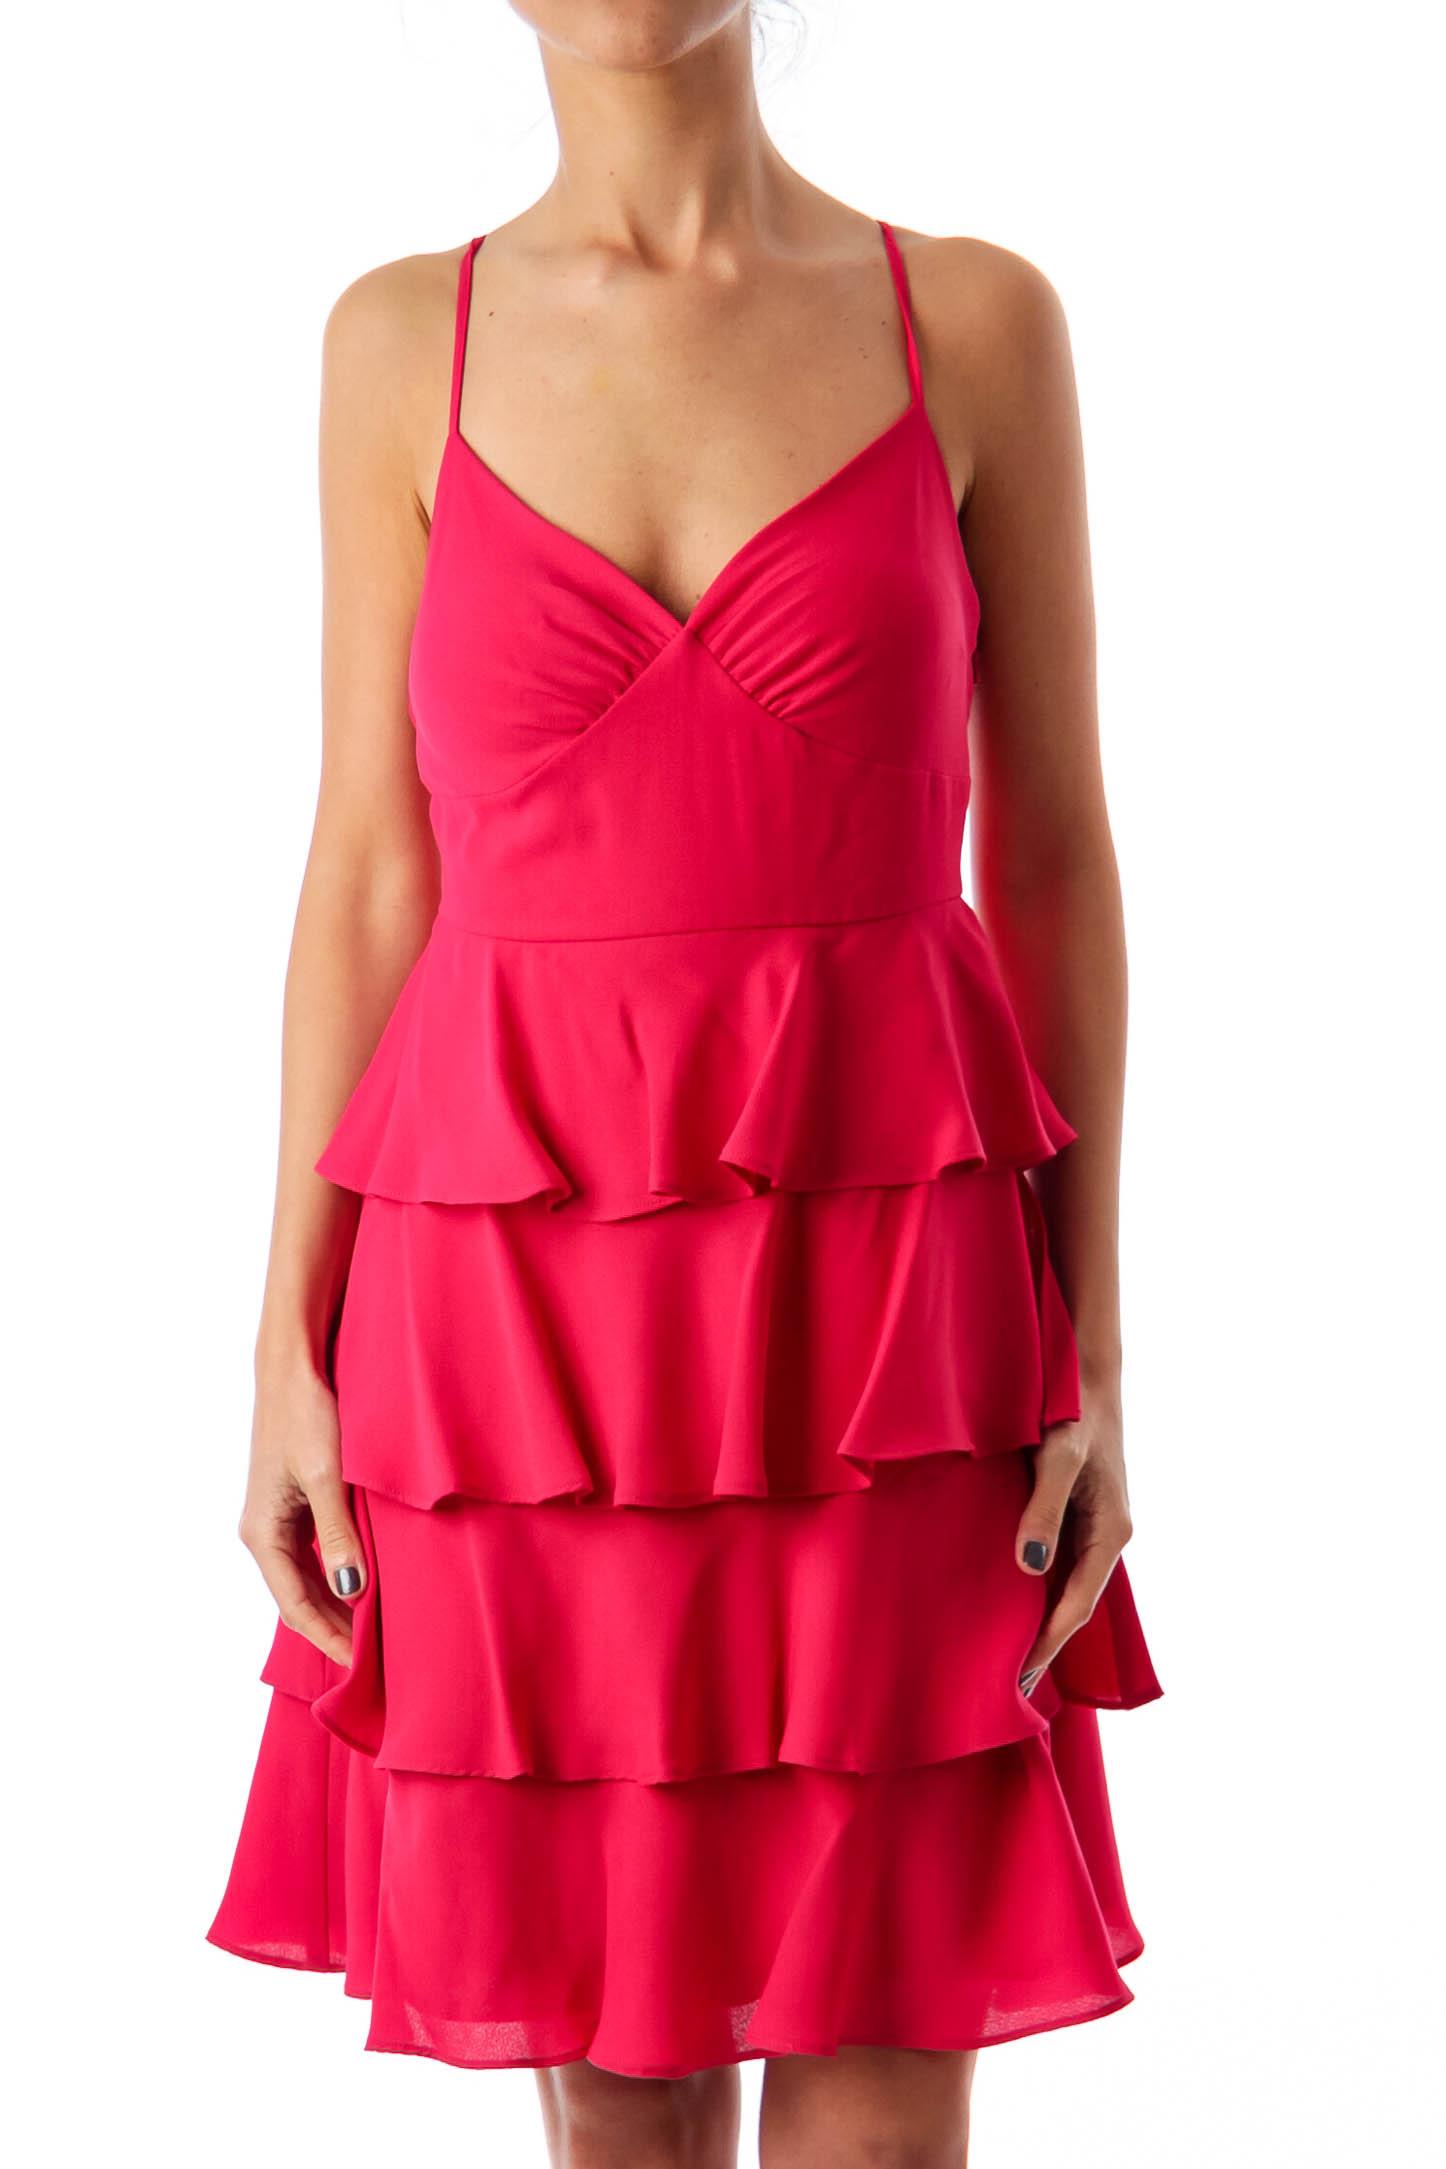 Fuchsia Ruffle Cocktail Dress